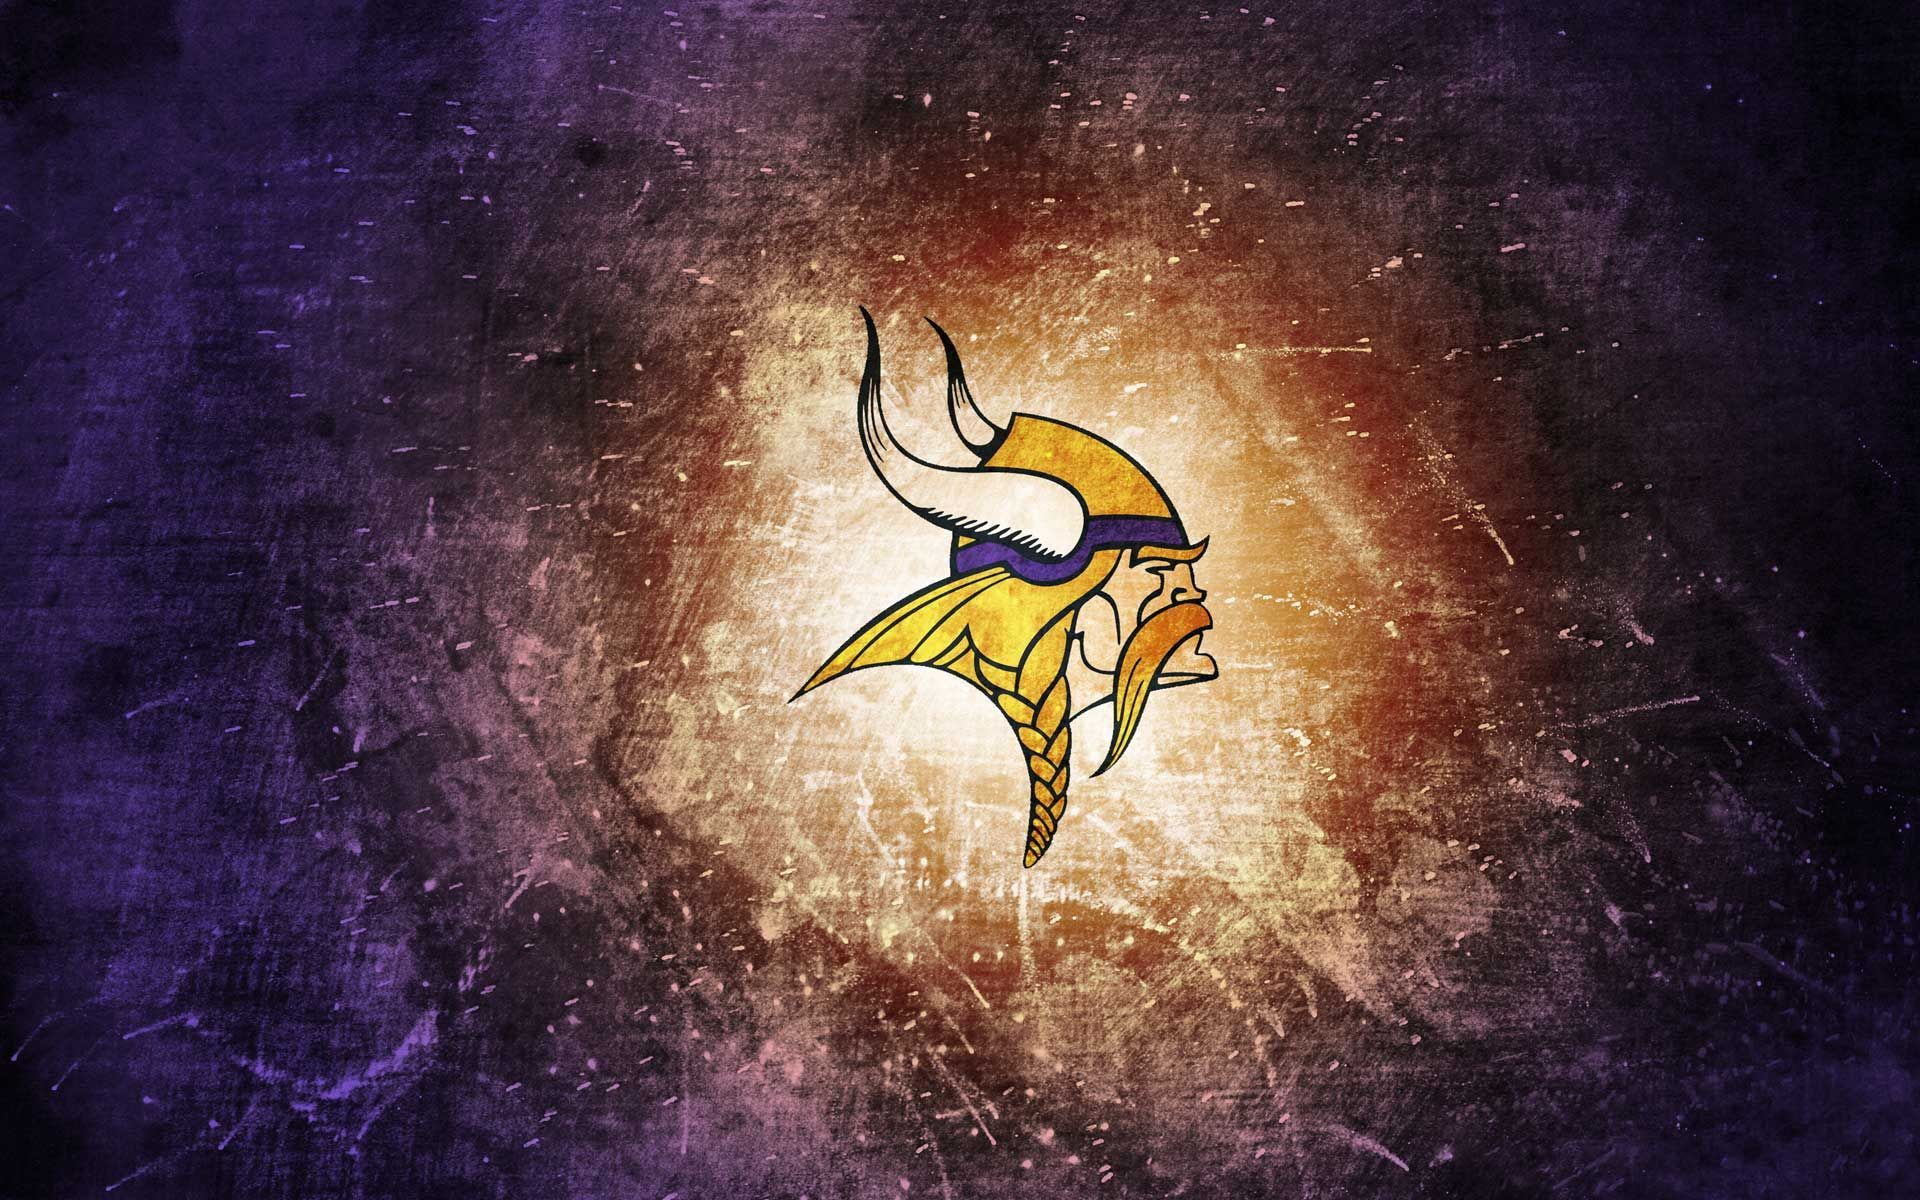 Awesome Minnesota Vikings Wallpapers Hd Wallpapers 1080p Download Full Hd Wall Minnesota Vikings Wallpaper Viking Wallpaper Hd Wallpapers 1080p